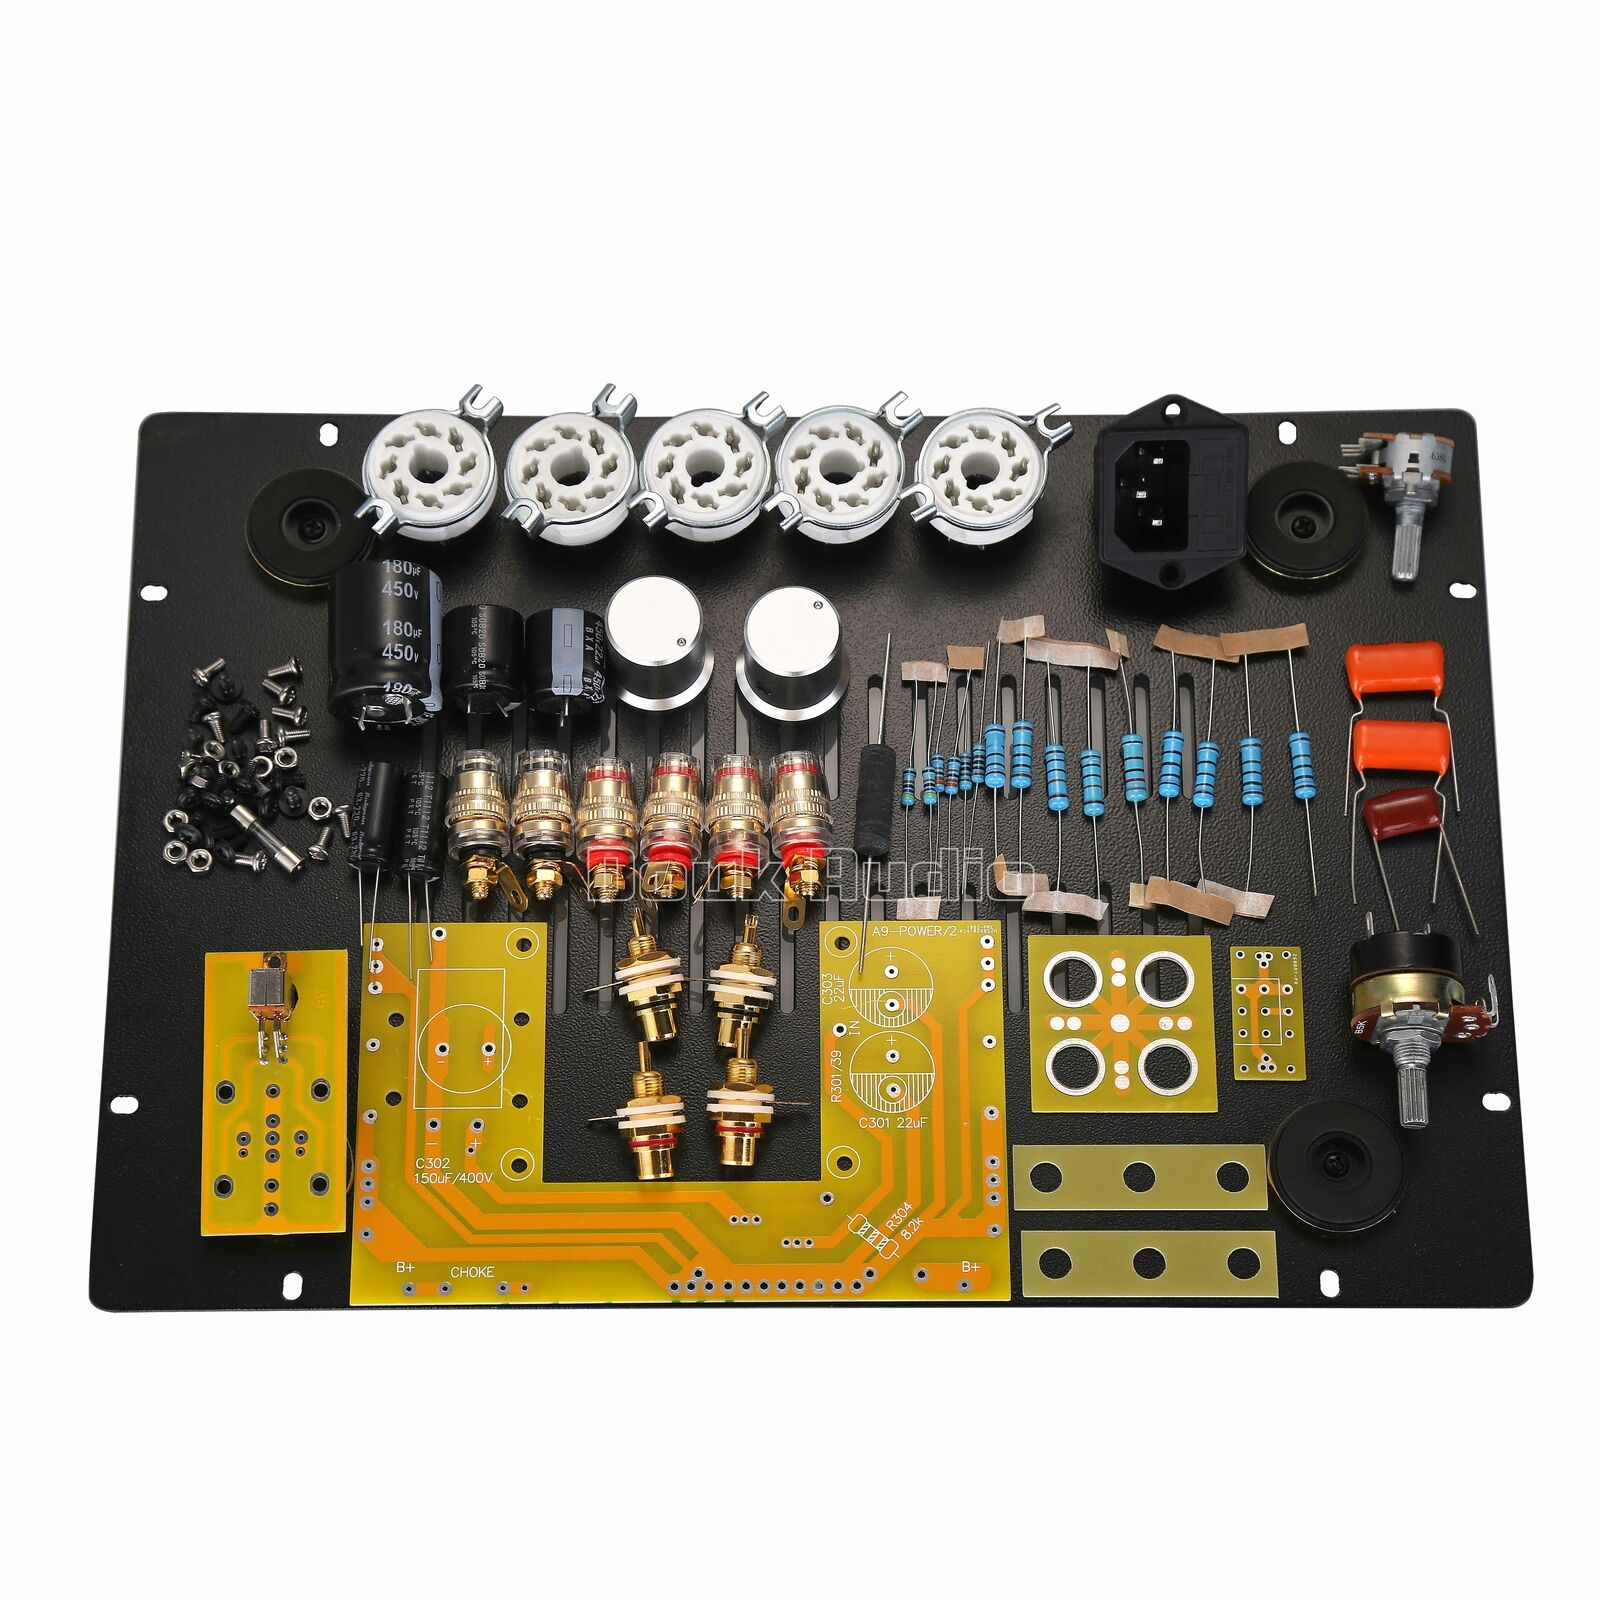 Douk audio el34 vacuum tube amplifier single ended hifi power amp 2017 douk audio el34 vacuum tube amplifier single ended power amp kit diy 12w2 solutioingenieria Images